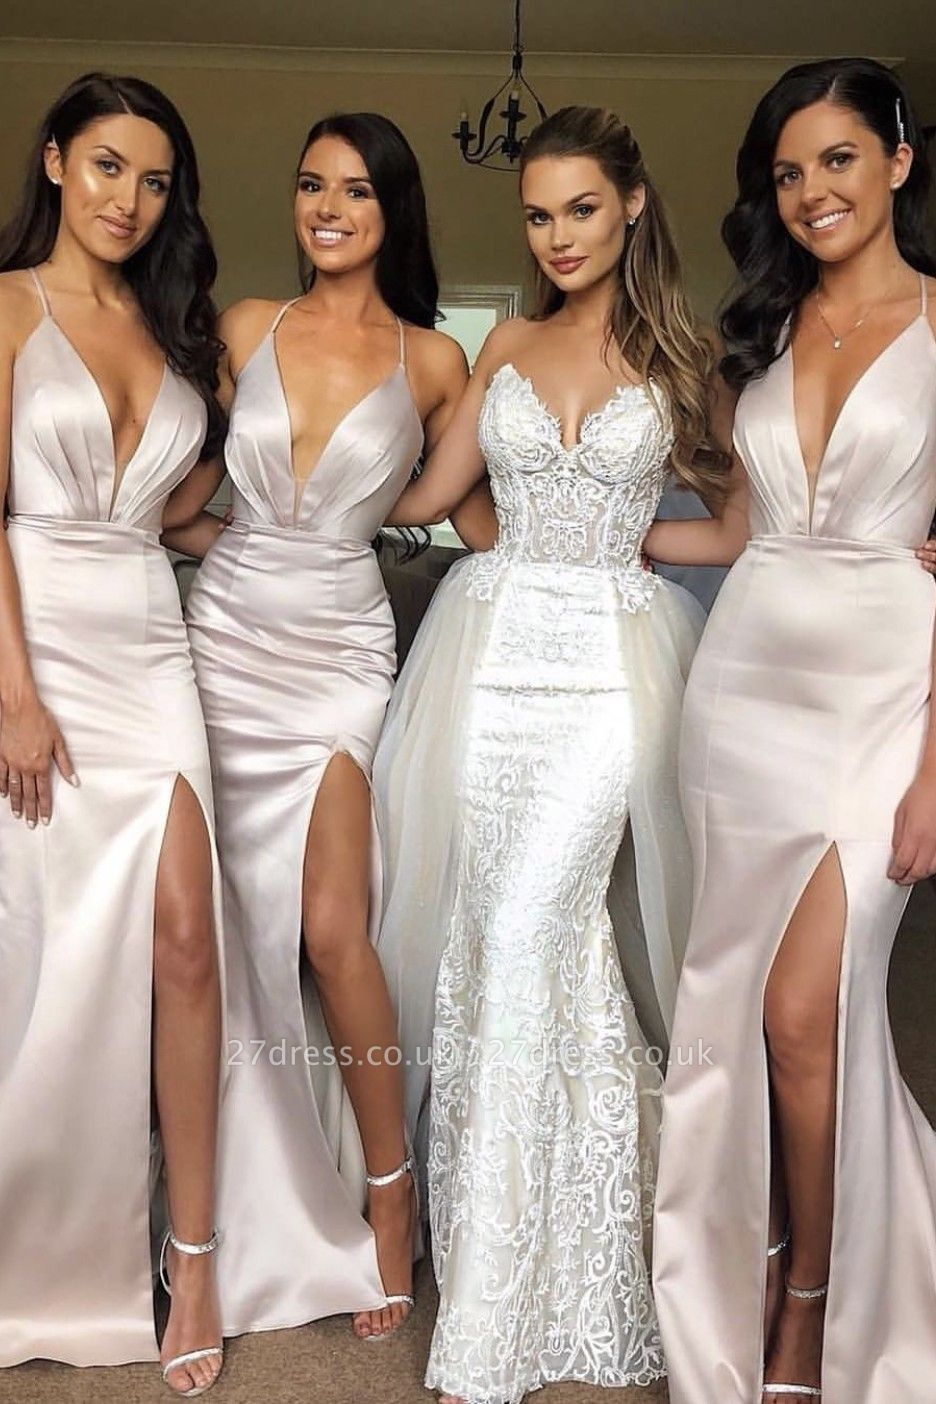 Elegant Slit Spaghetti Straps Bridesmaid Dress UK Affordable   Column Sleeveless V-neck Maid of Honor Dress UK